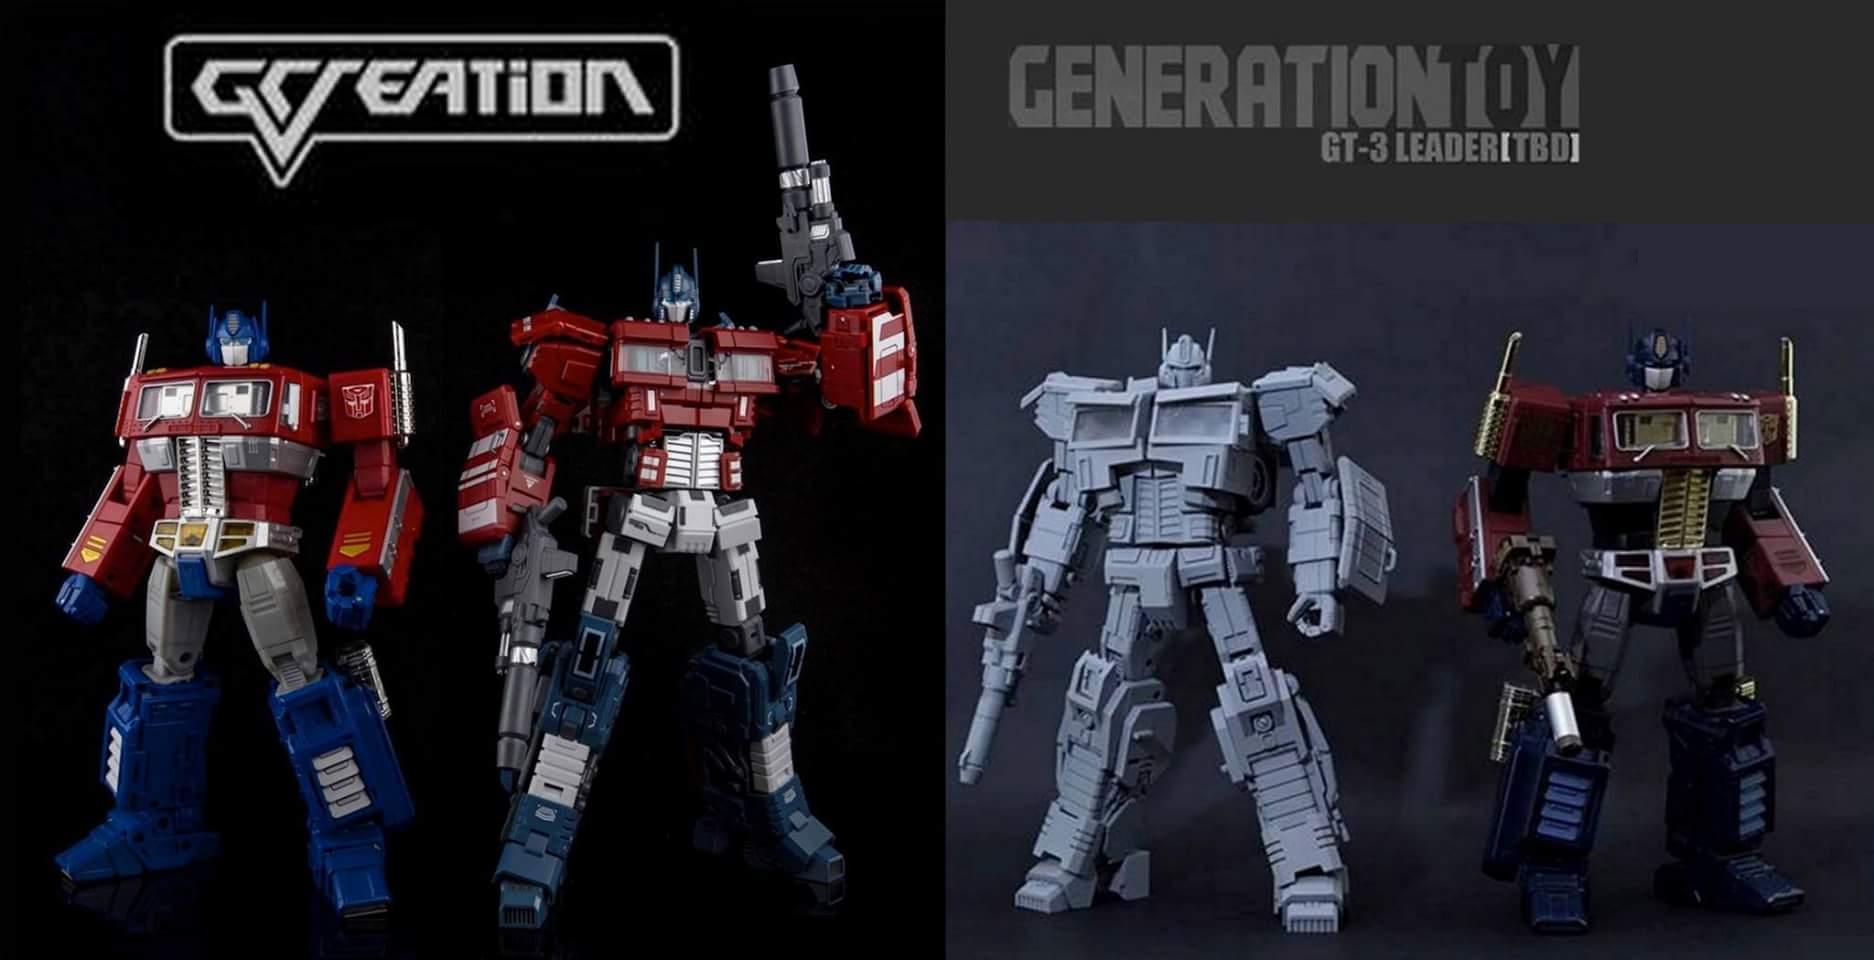 [Generation Toy] Produit Tiers - Jouets TF de la Gamme GT - des BD TF d'IDW - Page 3 NAysery1